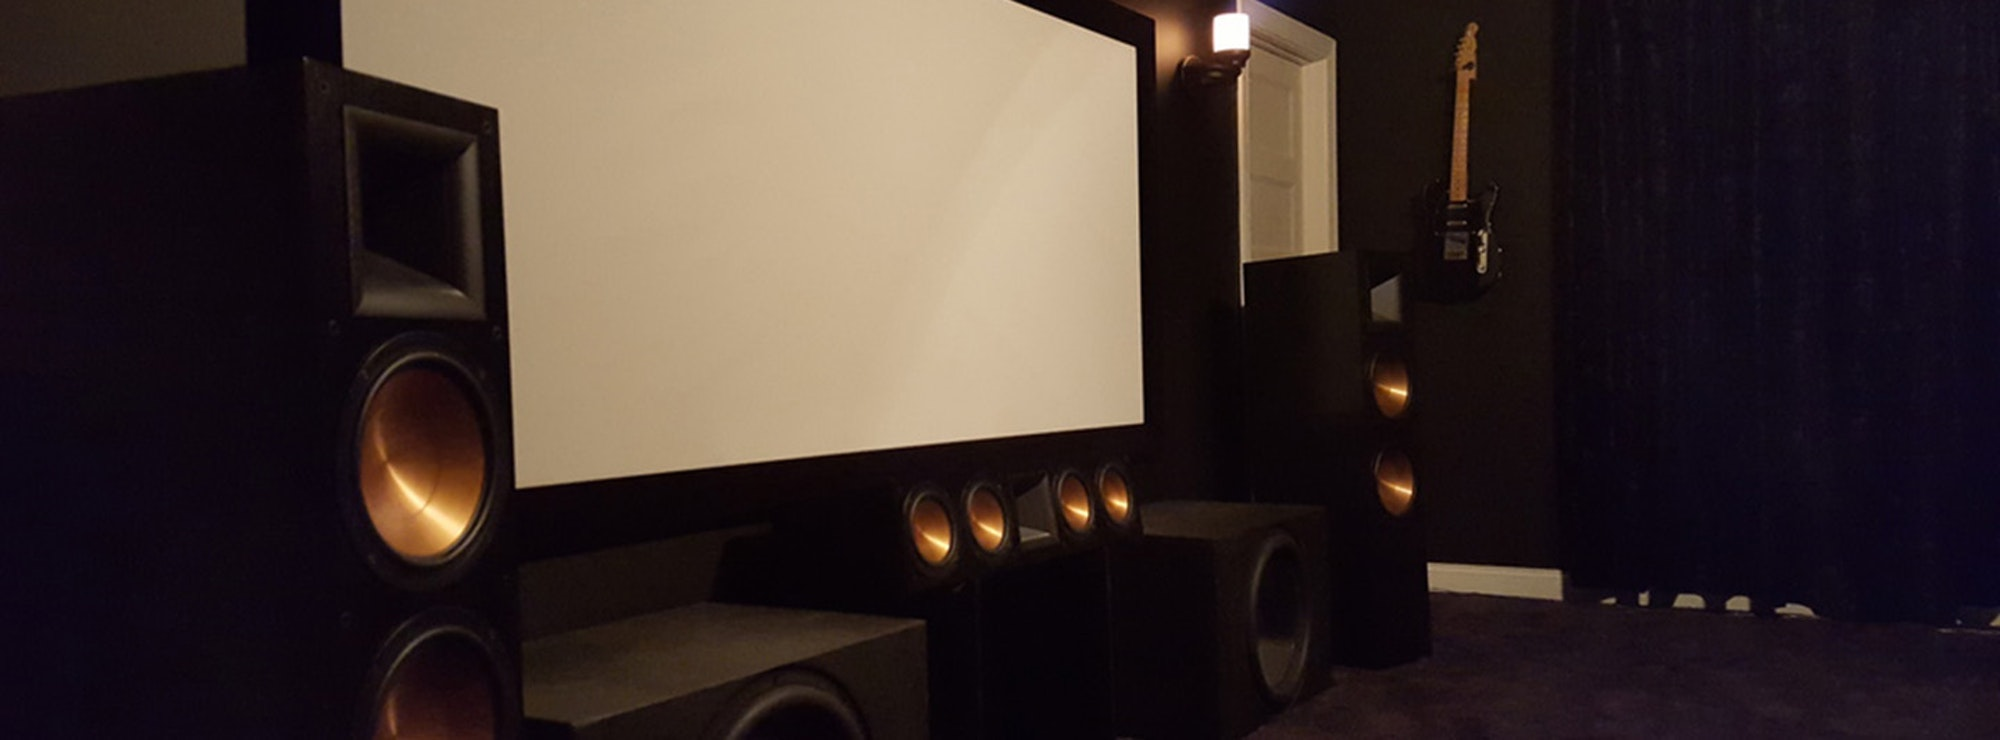 Klipsch home theater system